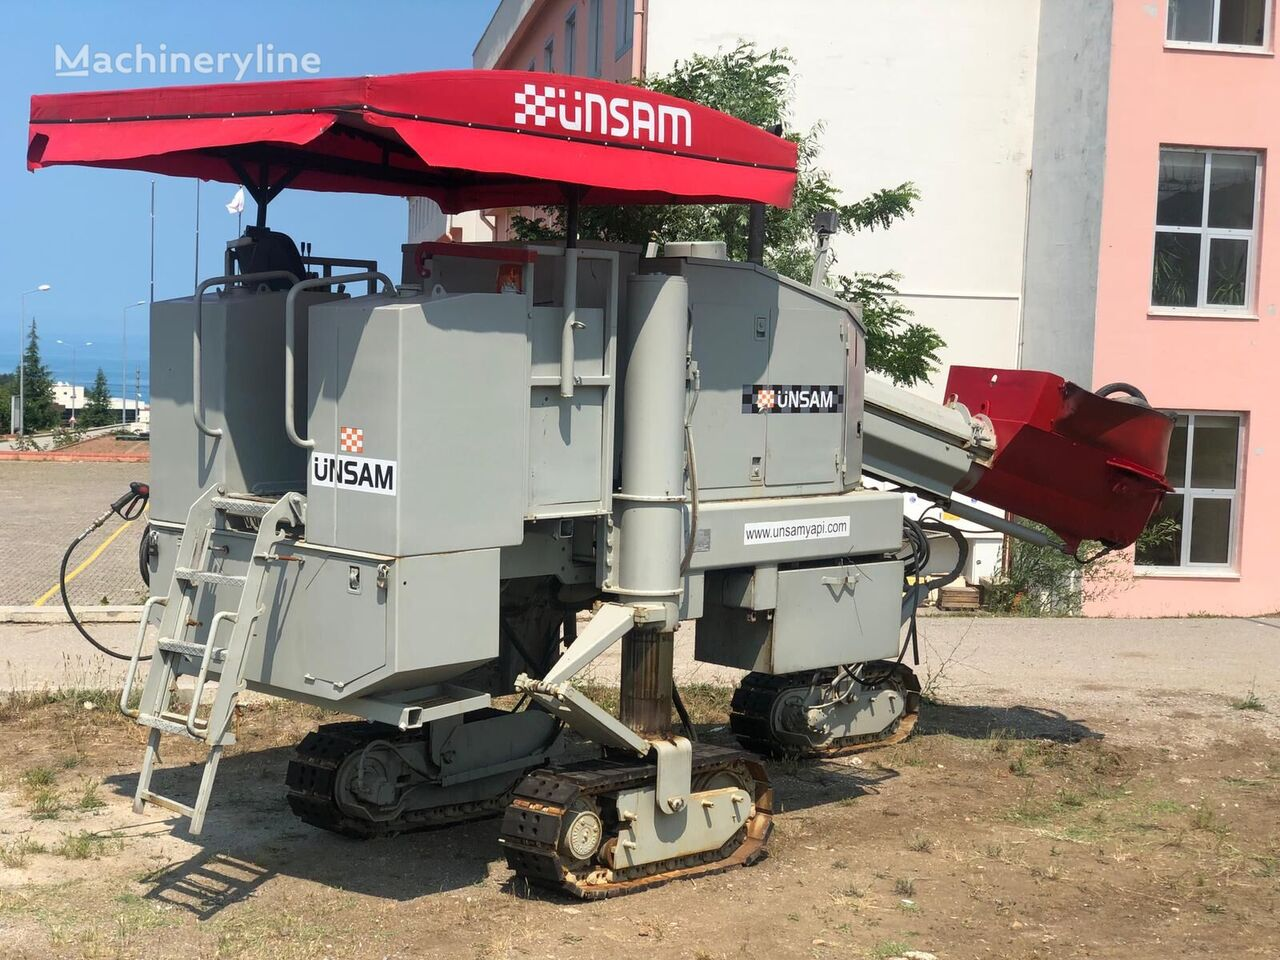 Power Curber 5700 C extendedora de hormigón